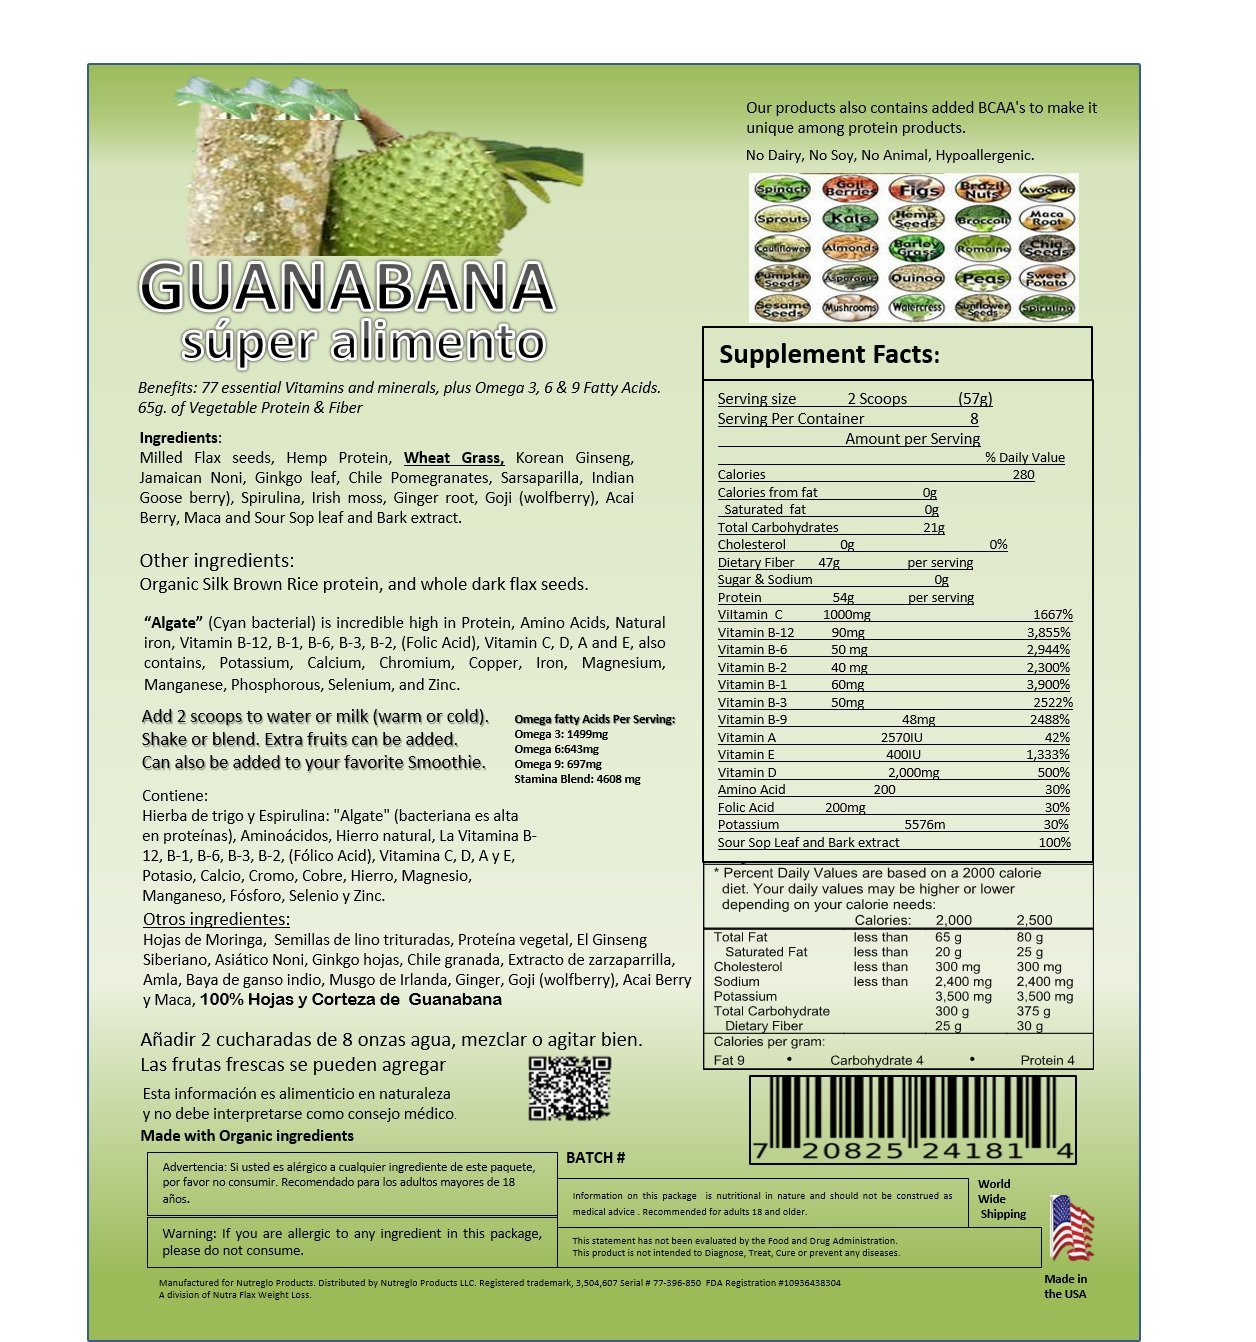 Amazon.com: Sour Sop (Guanabana / Graviola) High Energy Protein Shake 1lb: Health & Personal Care